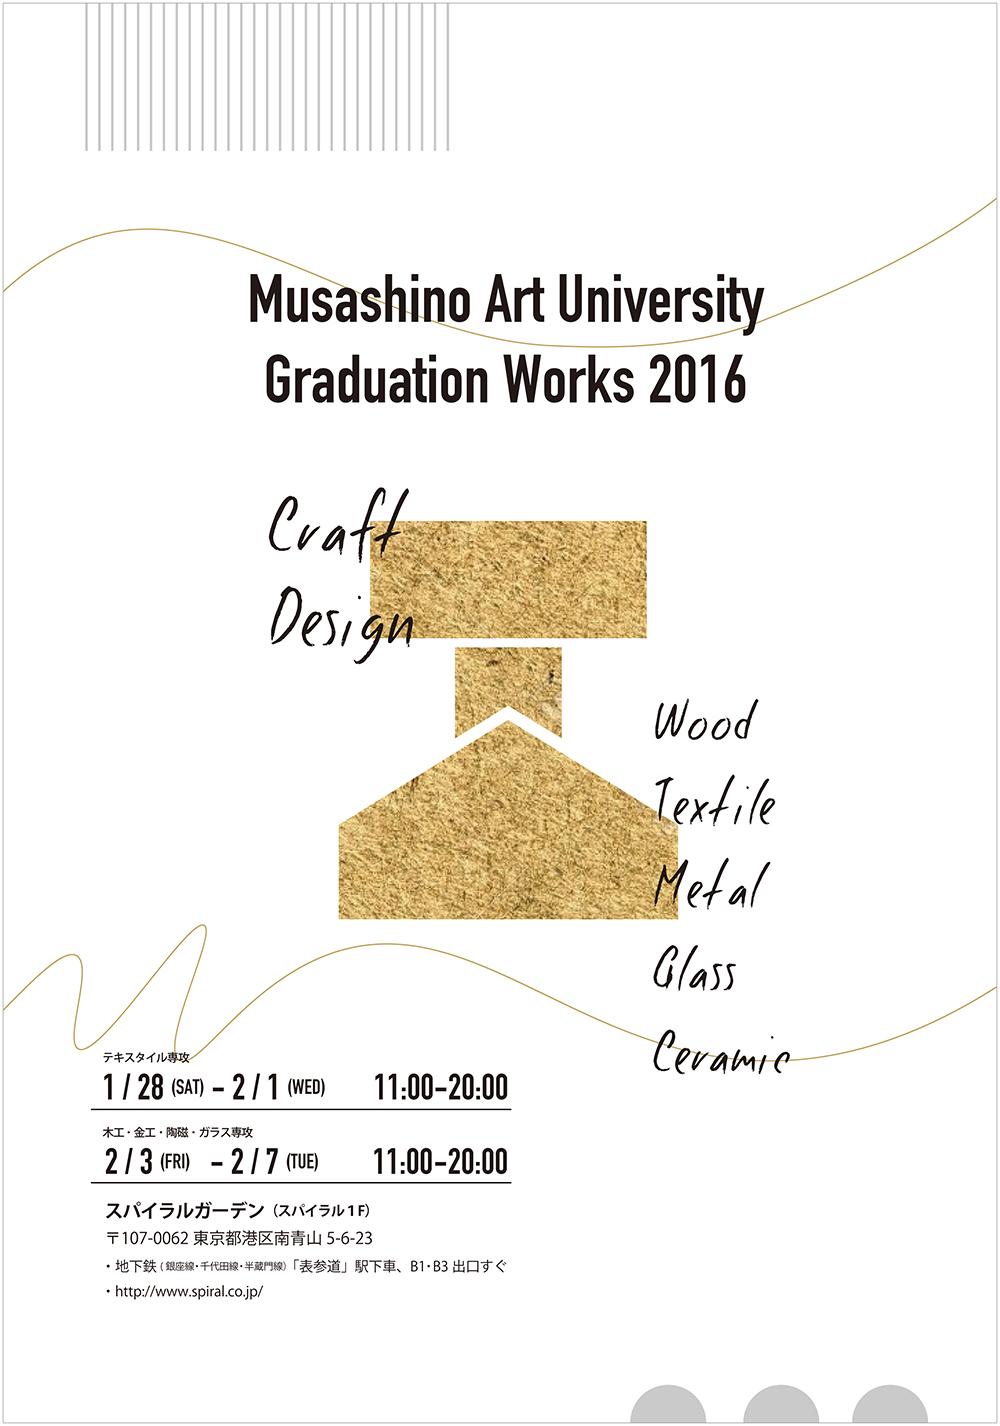 Graduation Works 2016 工芸工業デザイン学科 クラフトデザインコース 卒業制作展